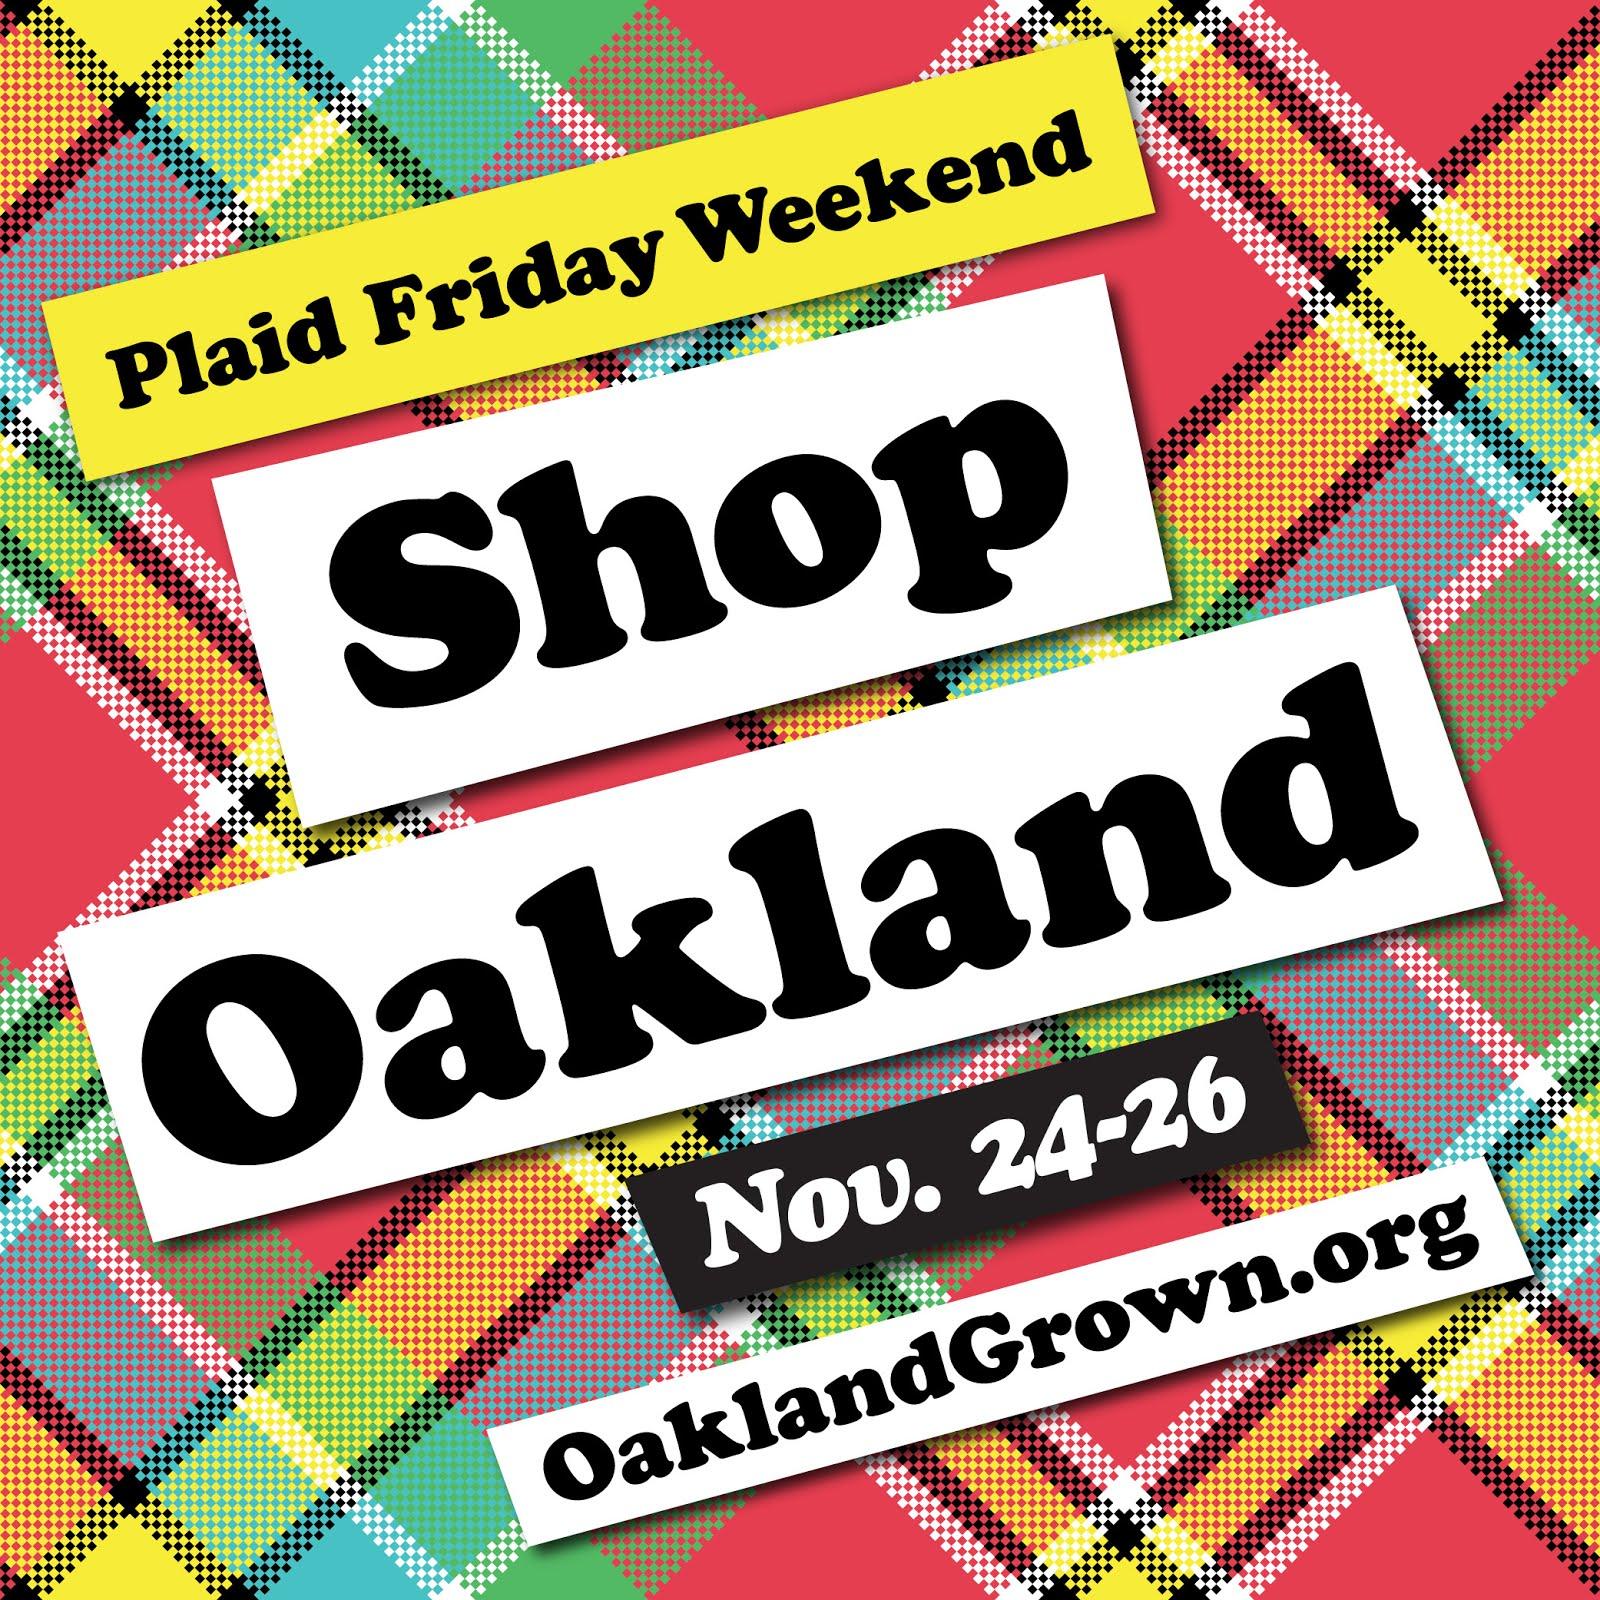 Plaid Friday Weekend - Shop Local - OaklandGrown.org